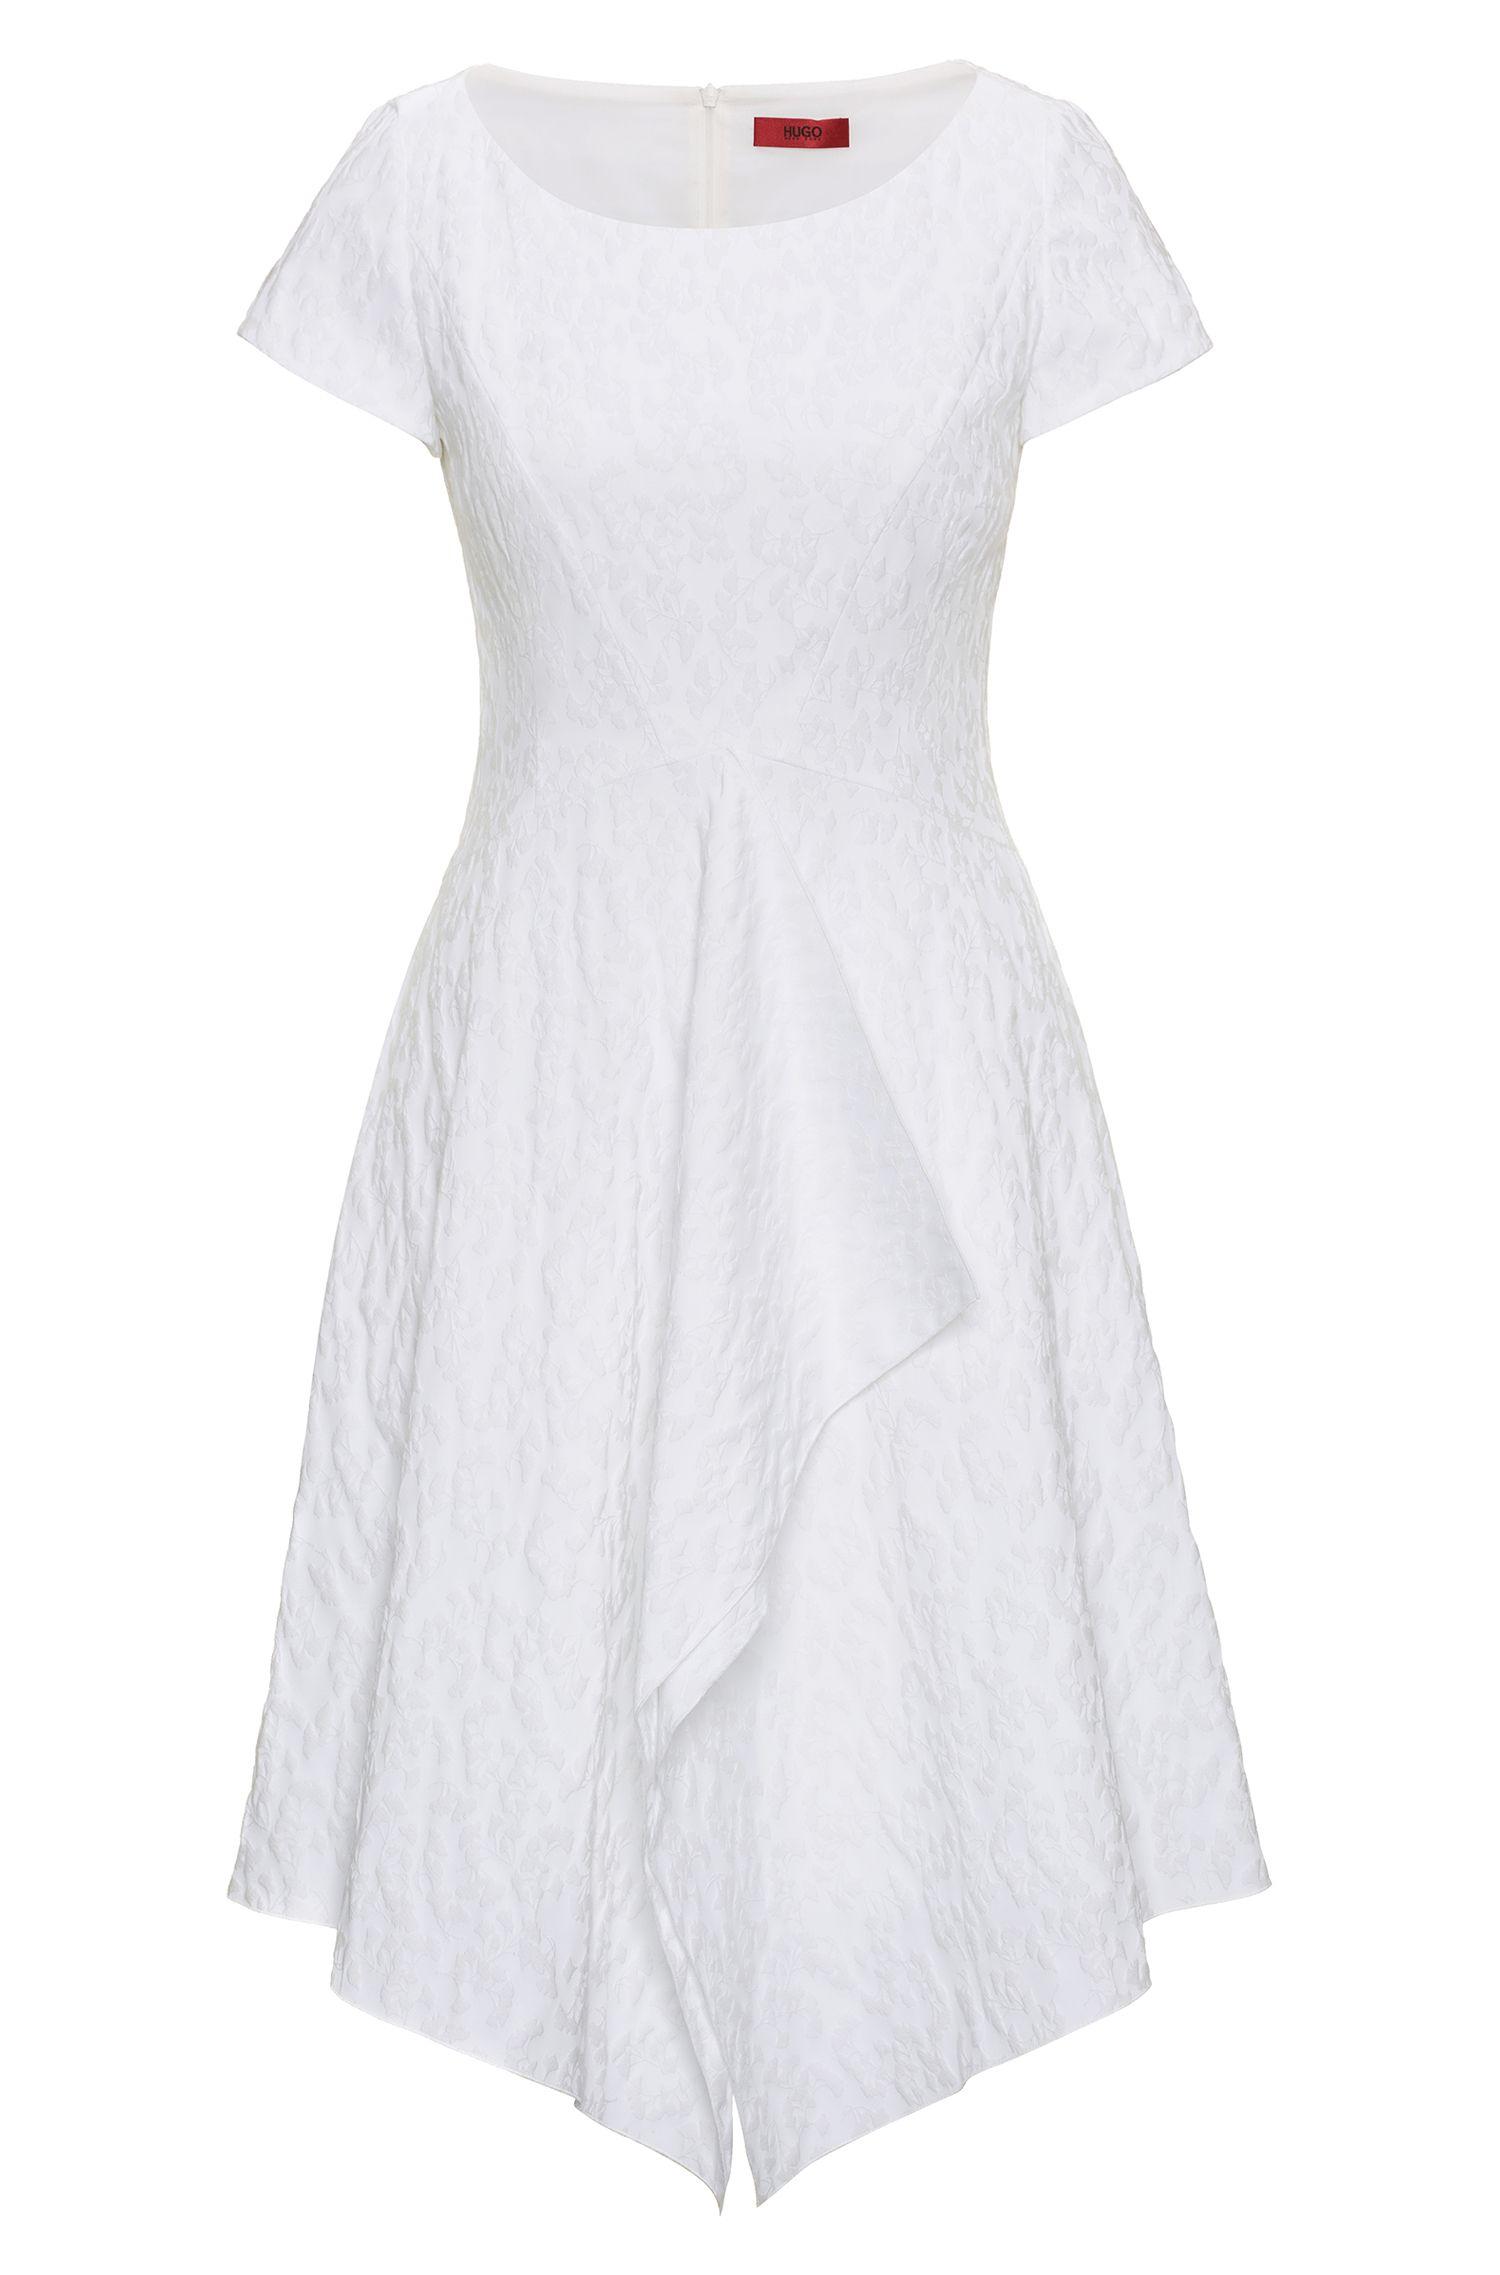 Ruffled Dress | KIenia